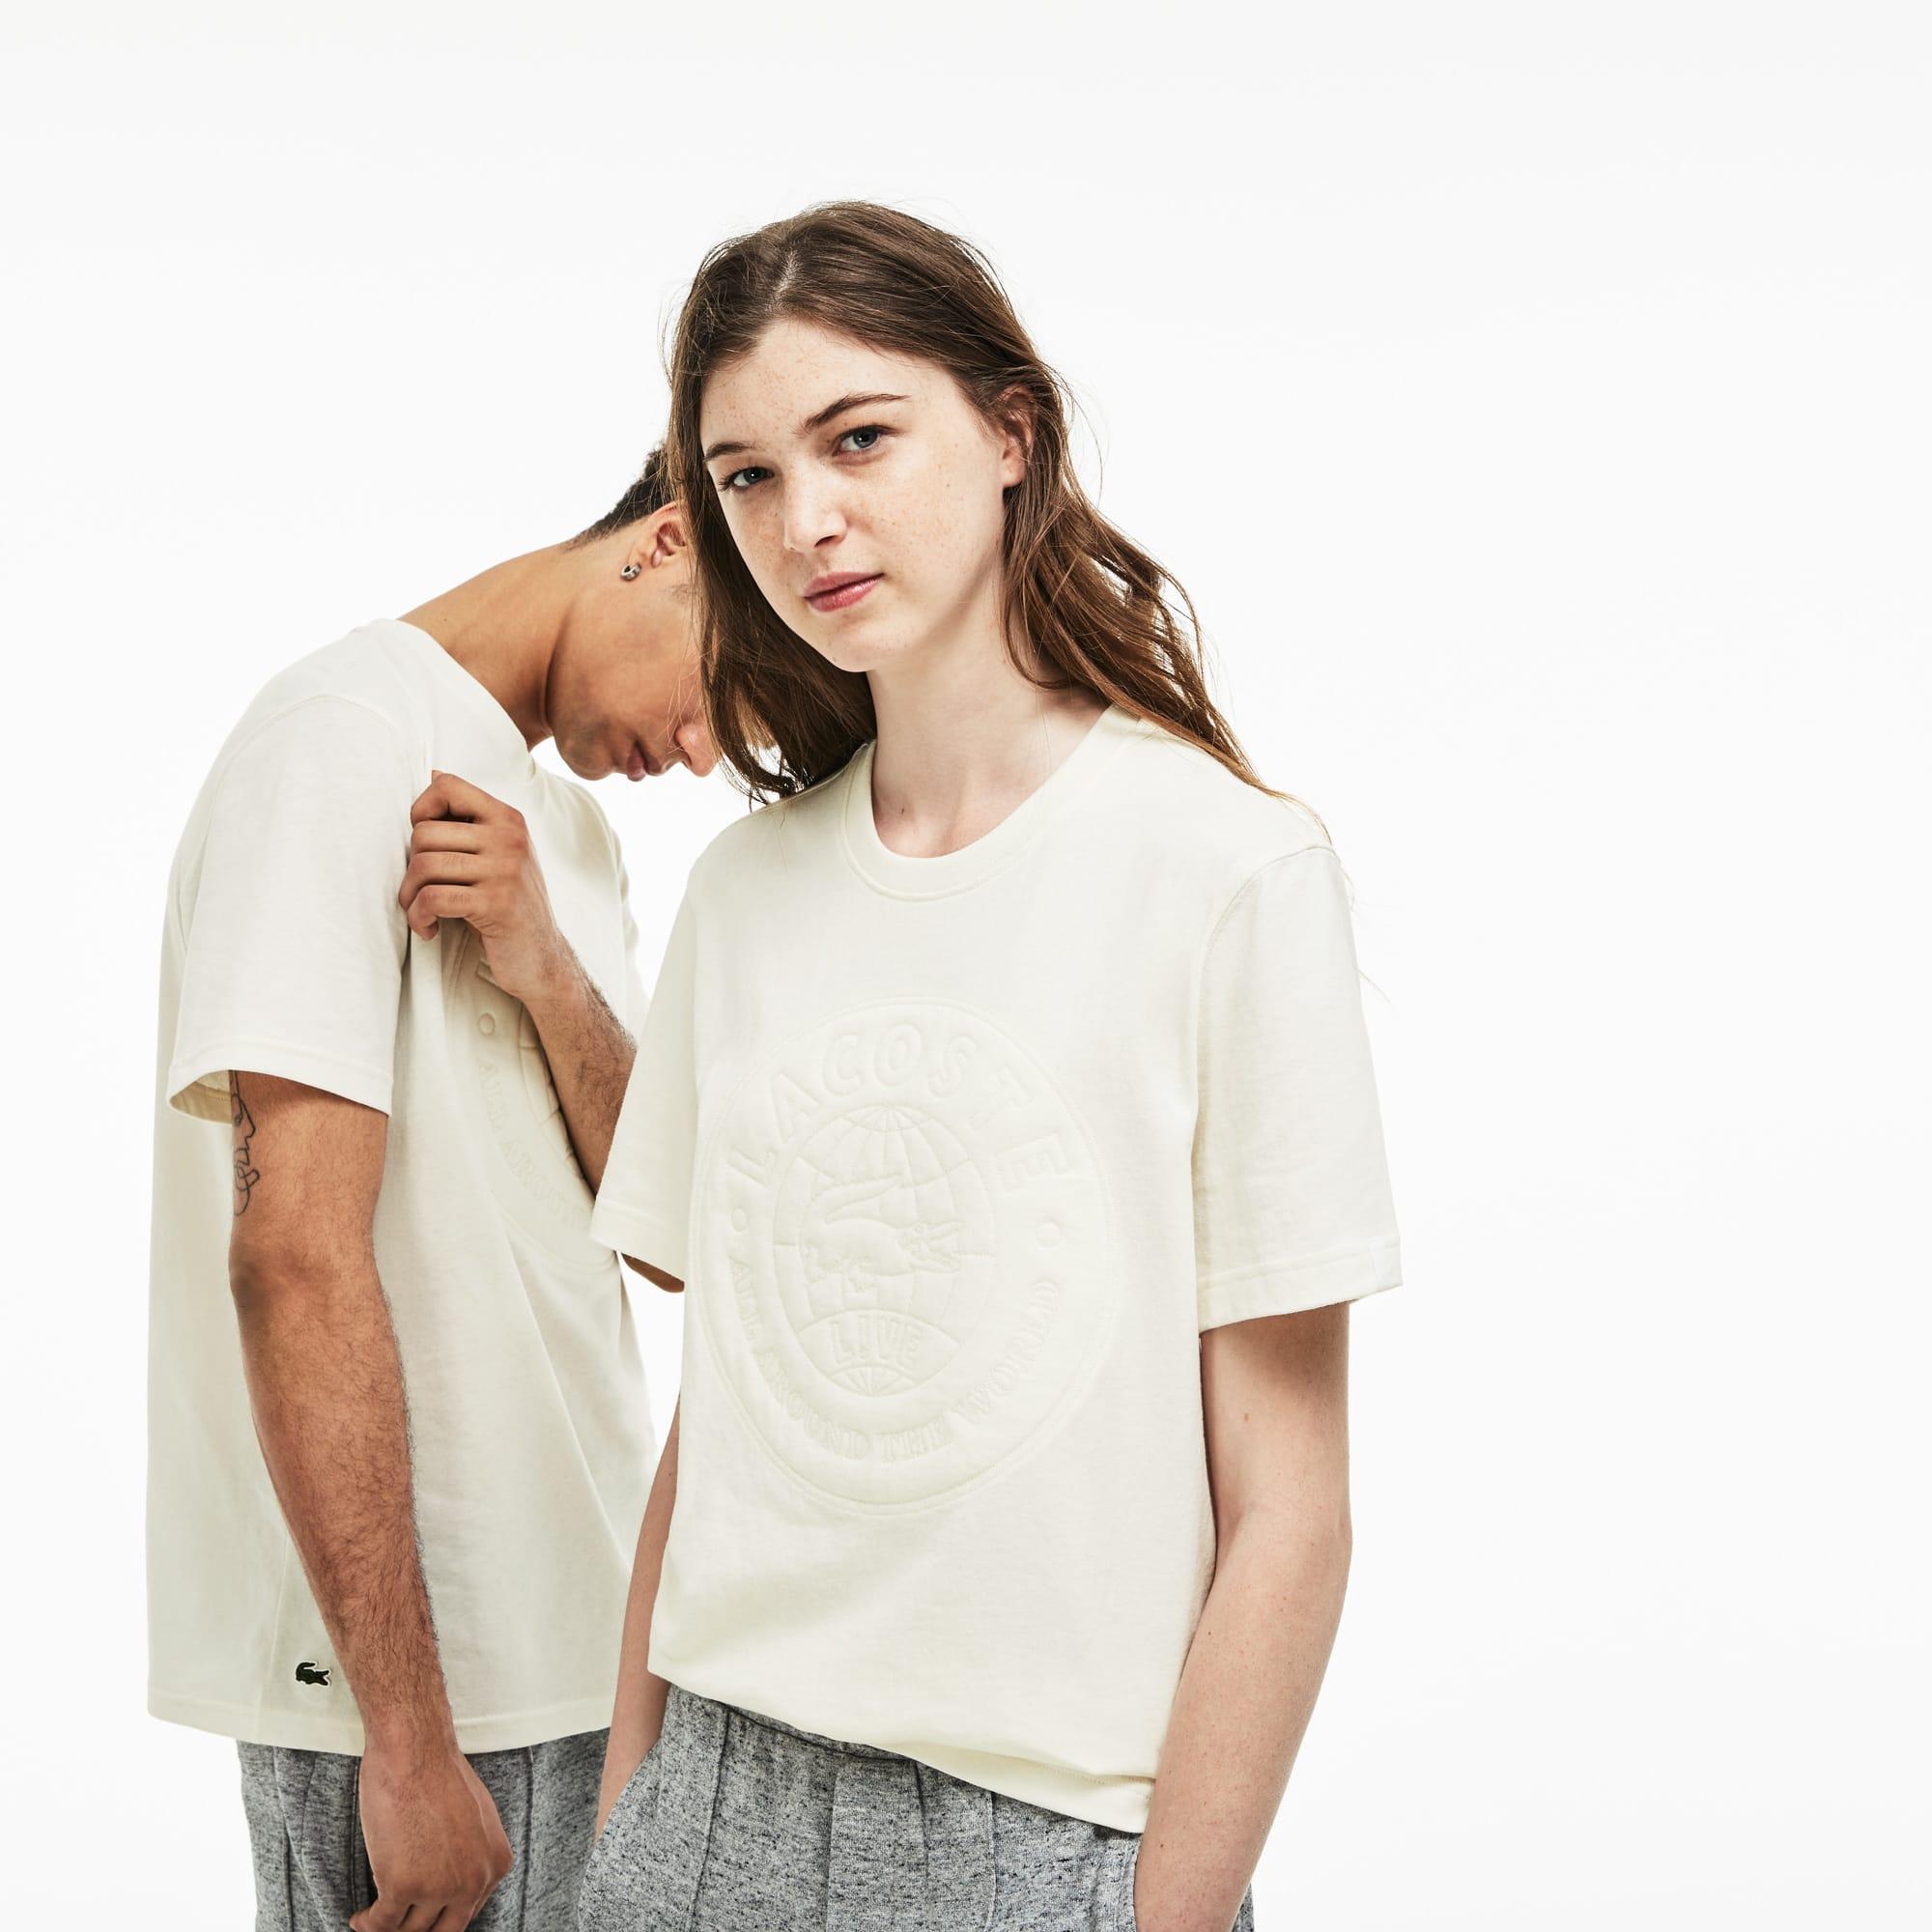 Camiseta de cuello redondo unisex Lacoste LIVE de punto jersey con insignia oversize